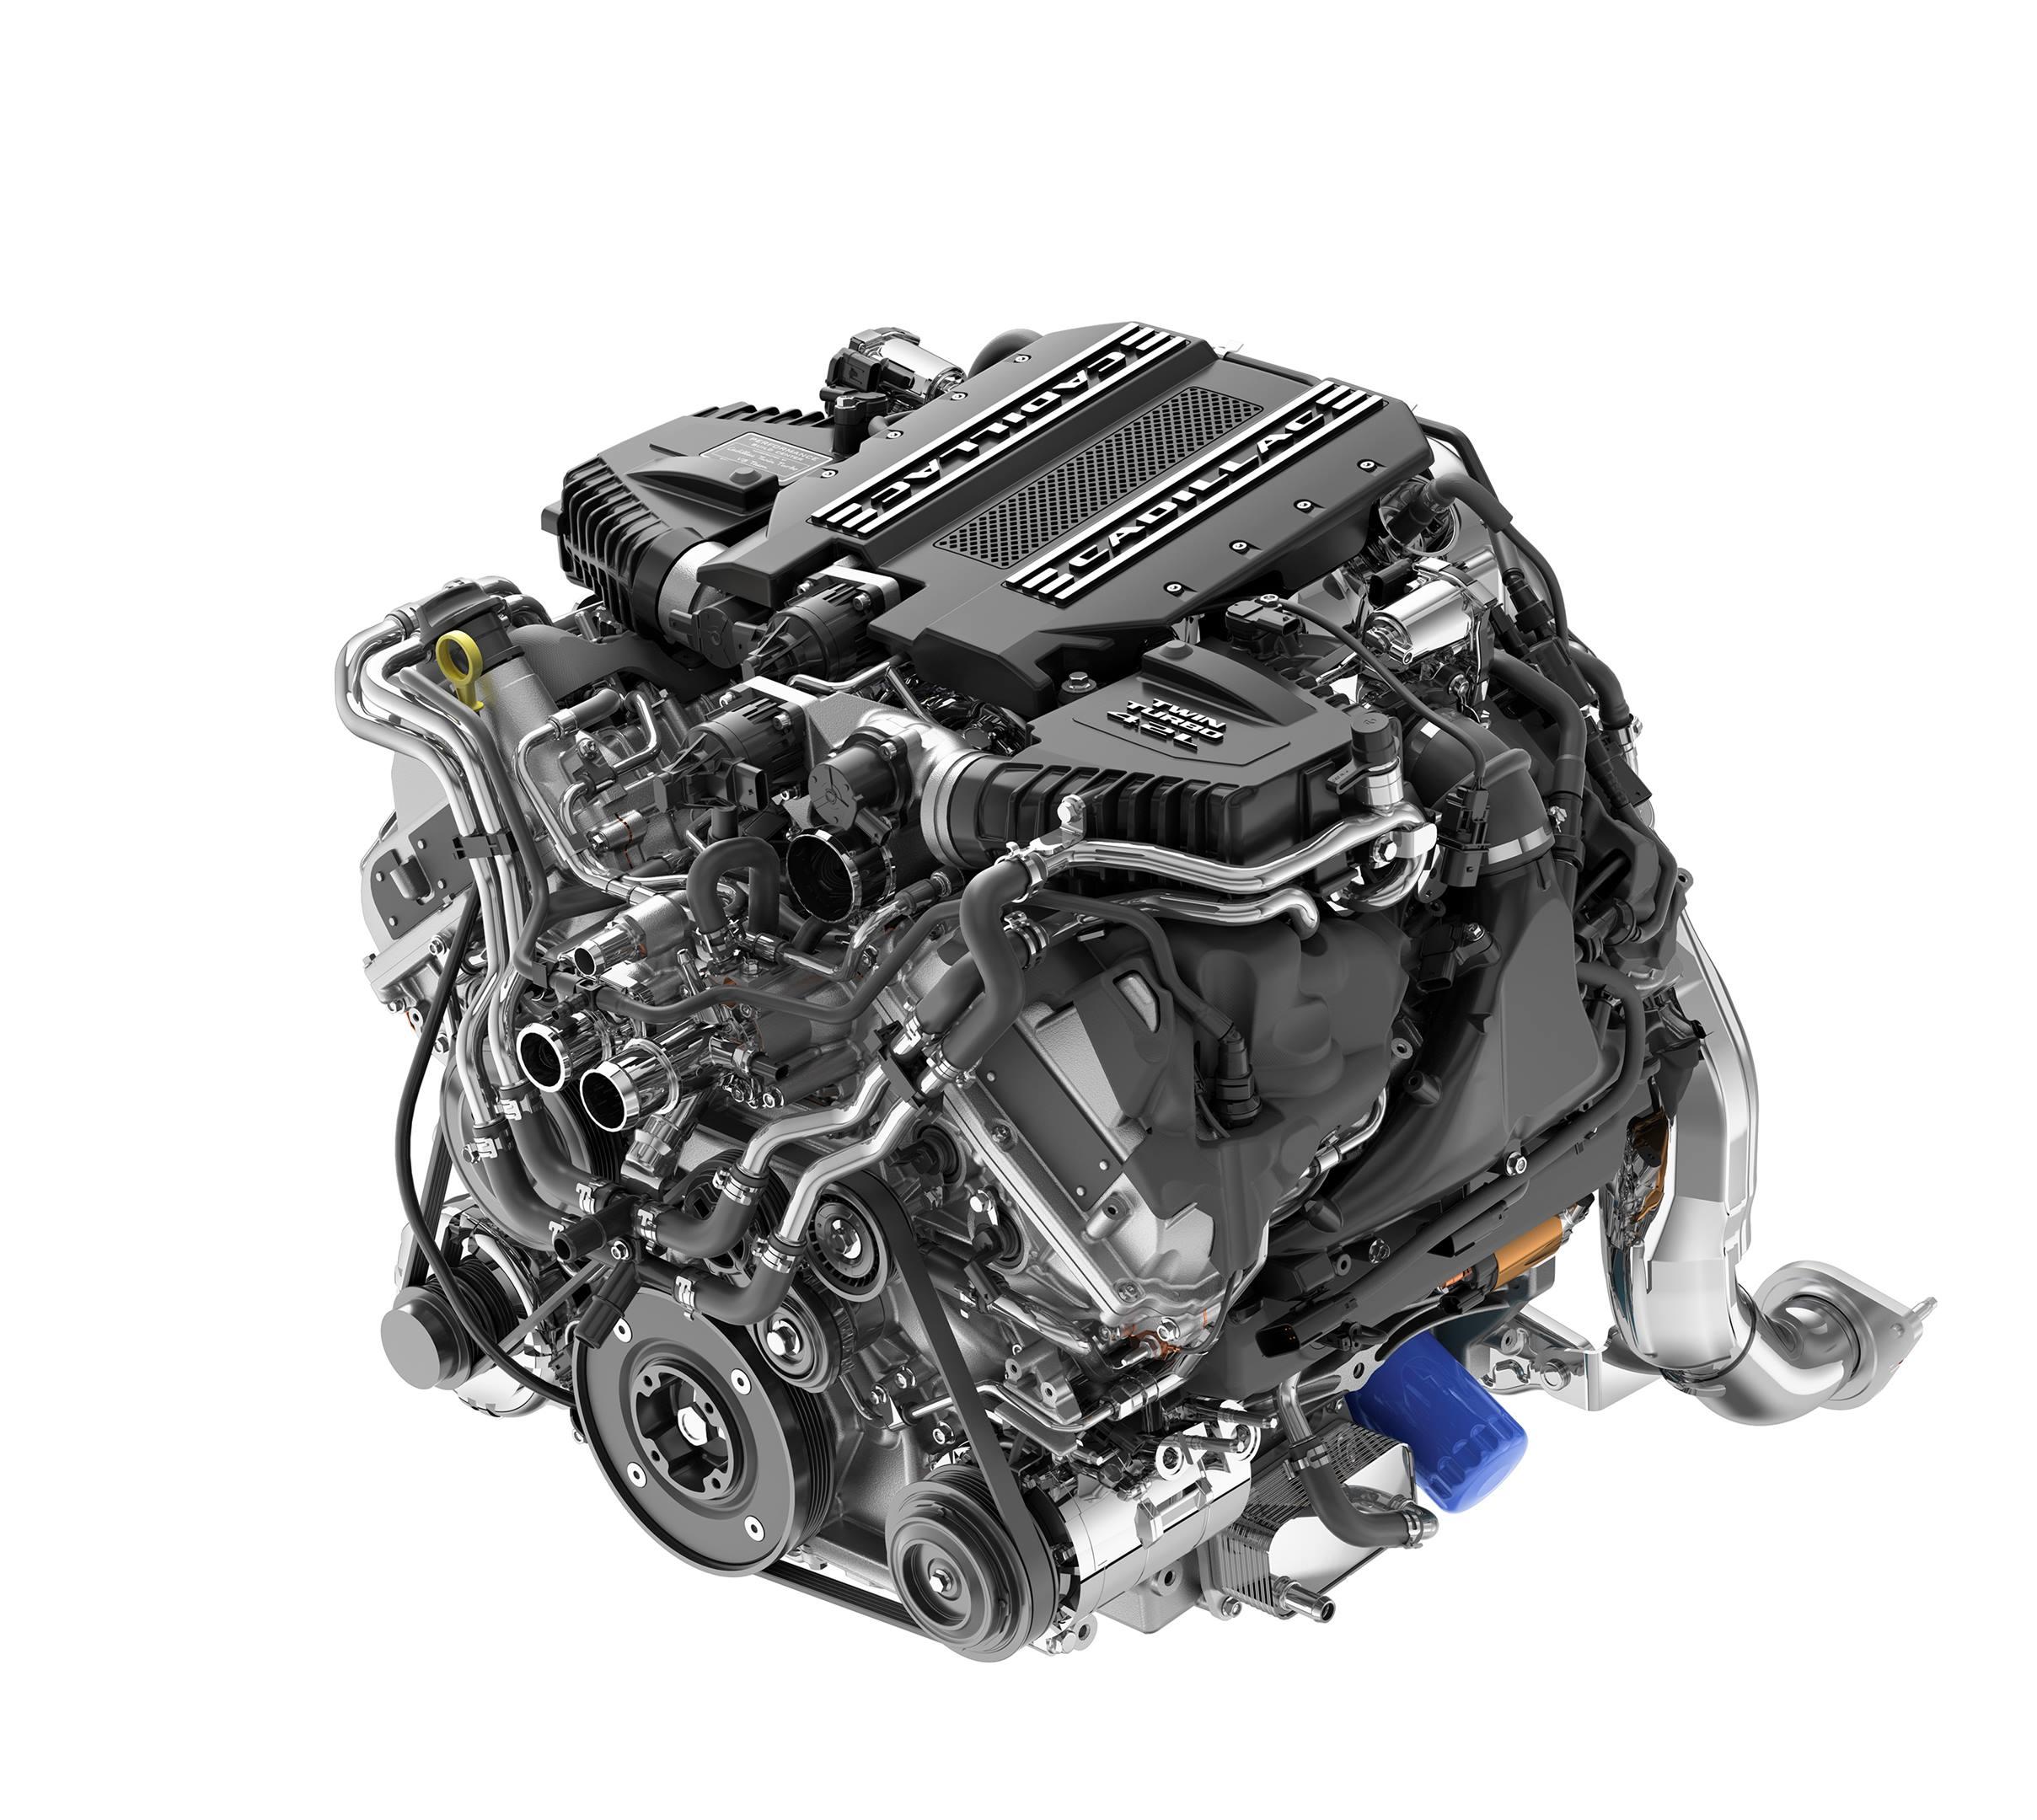 Cadillac 4.2L twin-turbo V-8